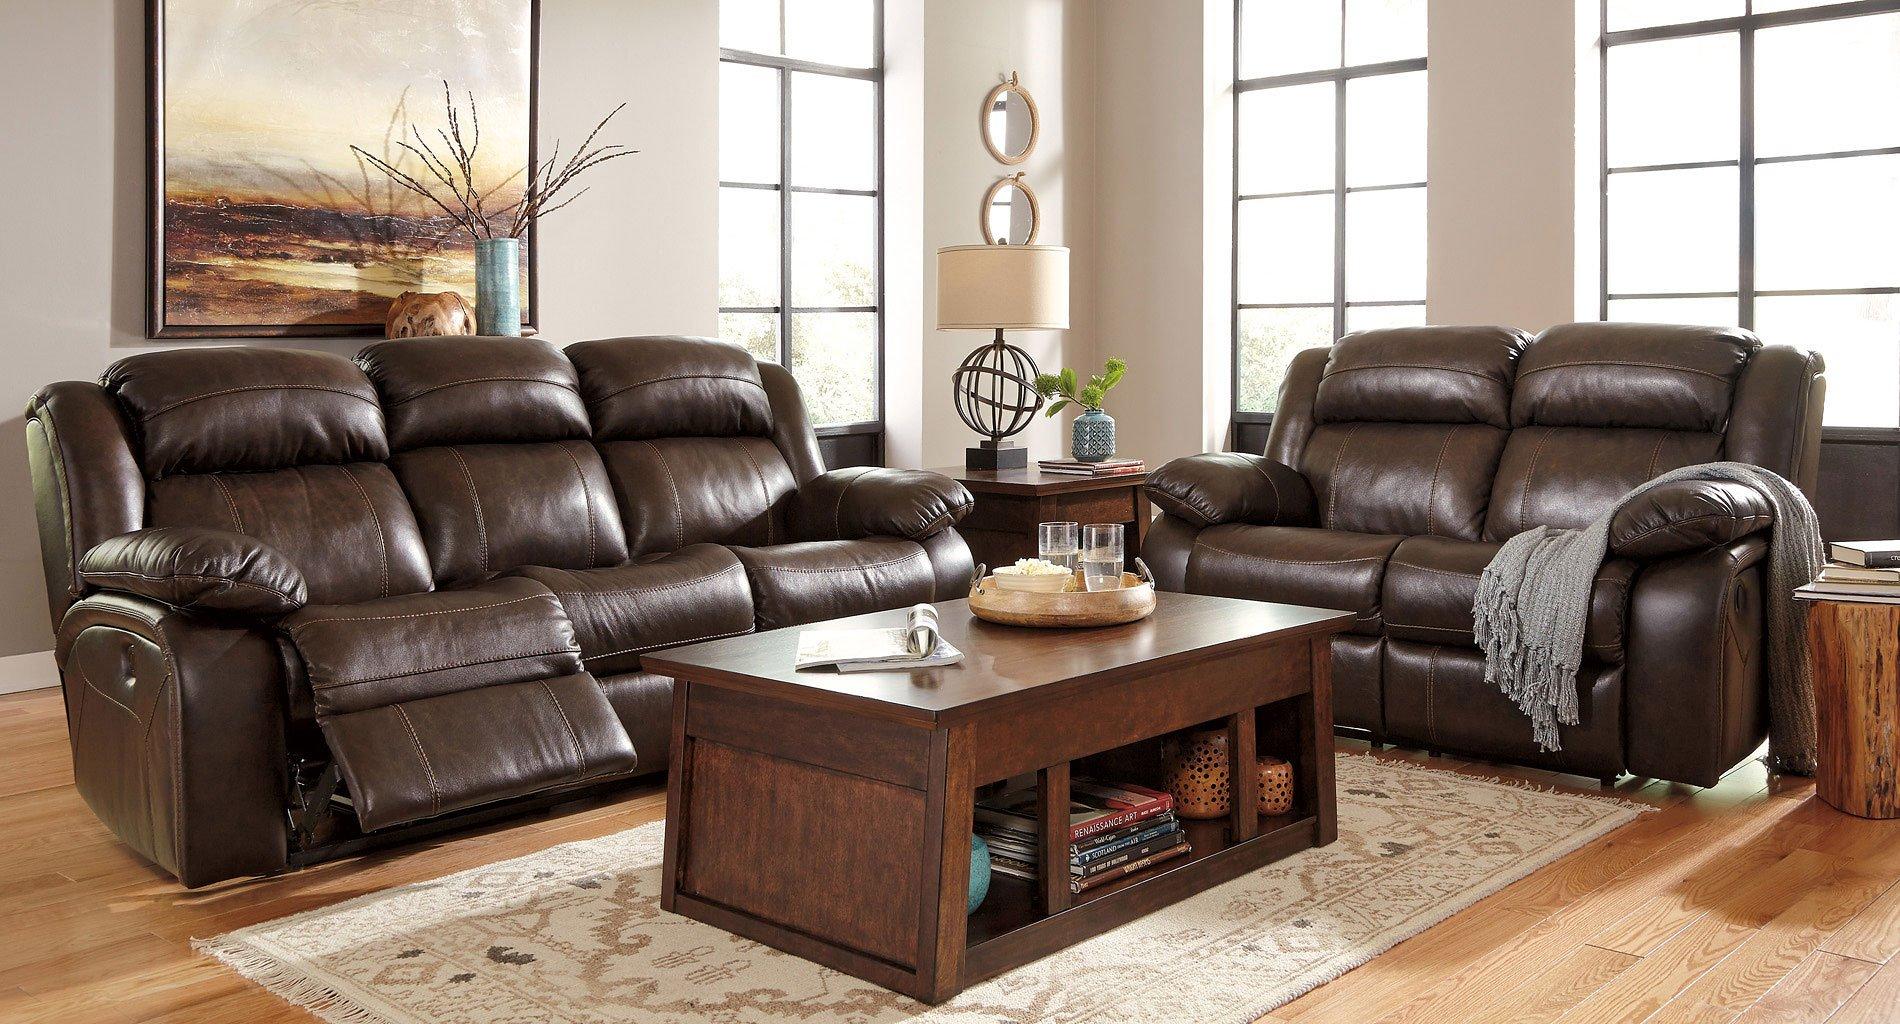 Branton Antique Reclining Living Room Set W Power By Signature Design By Ashley Furniturepick